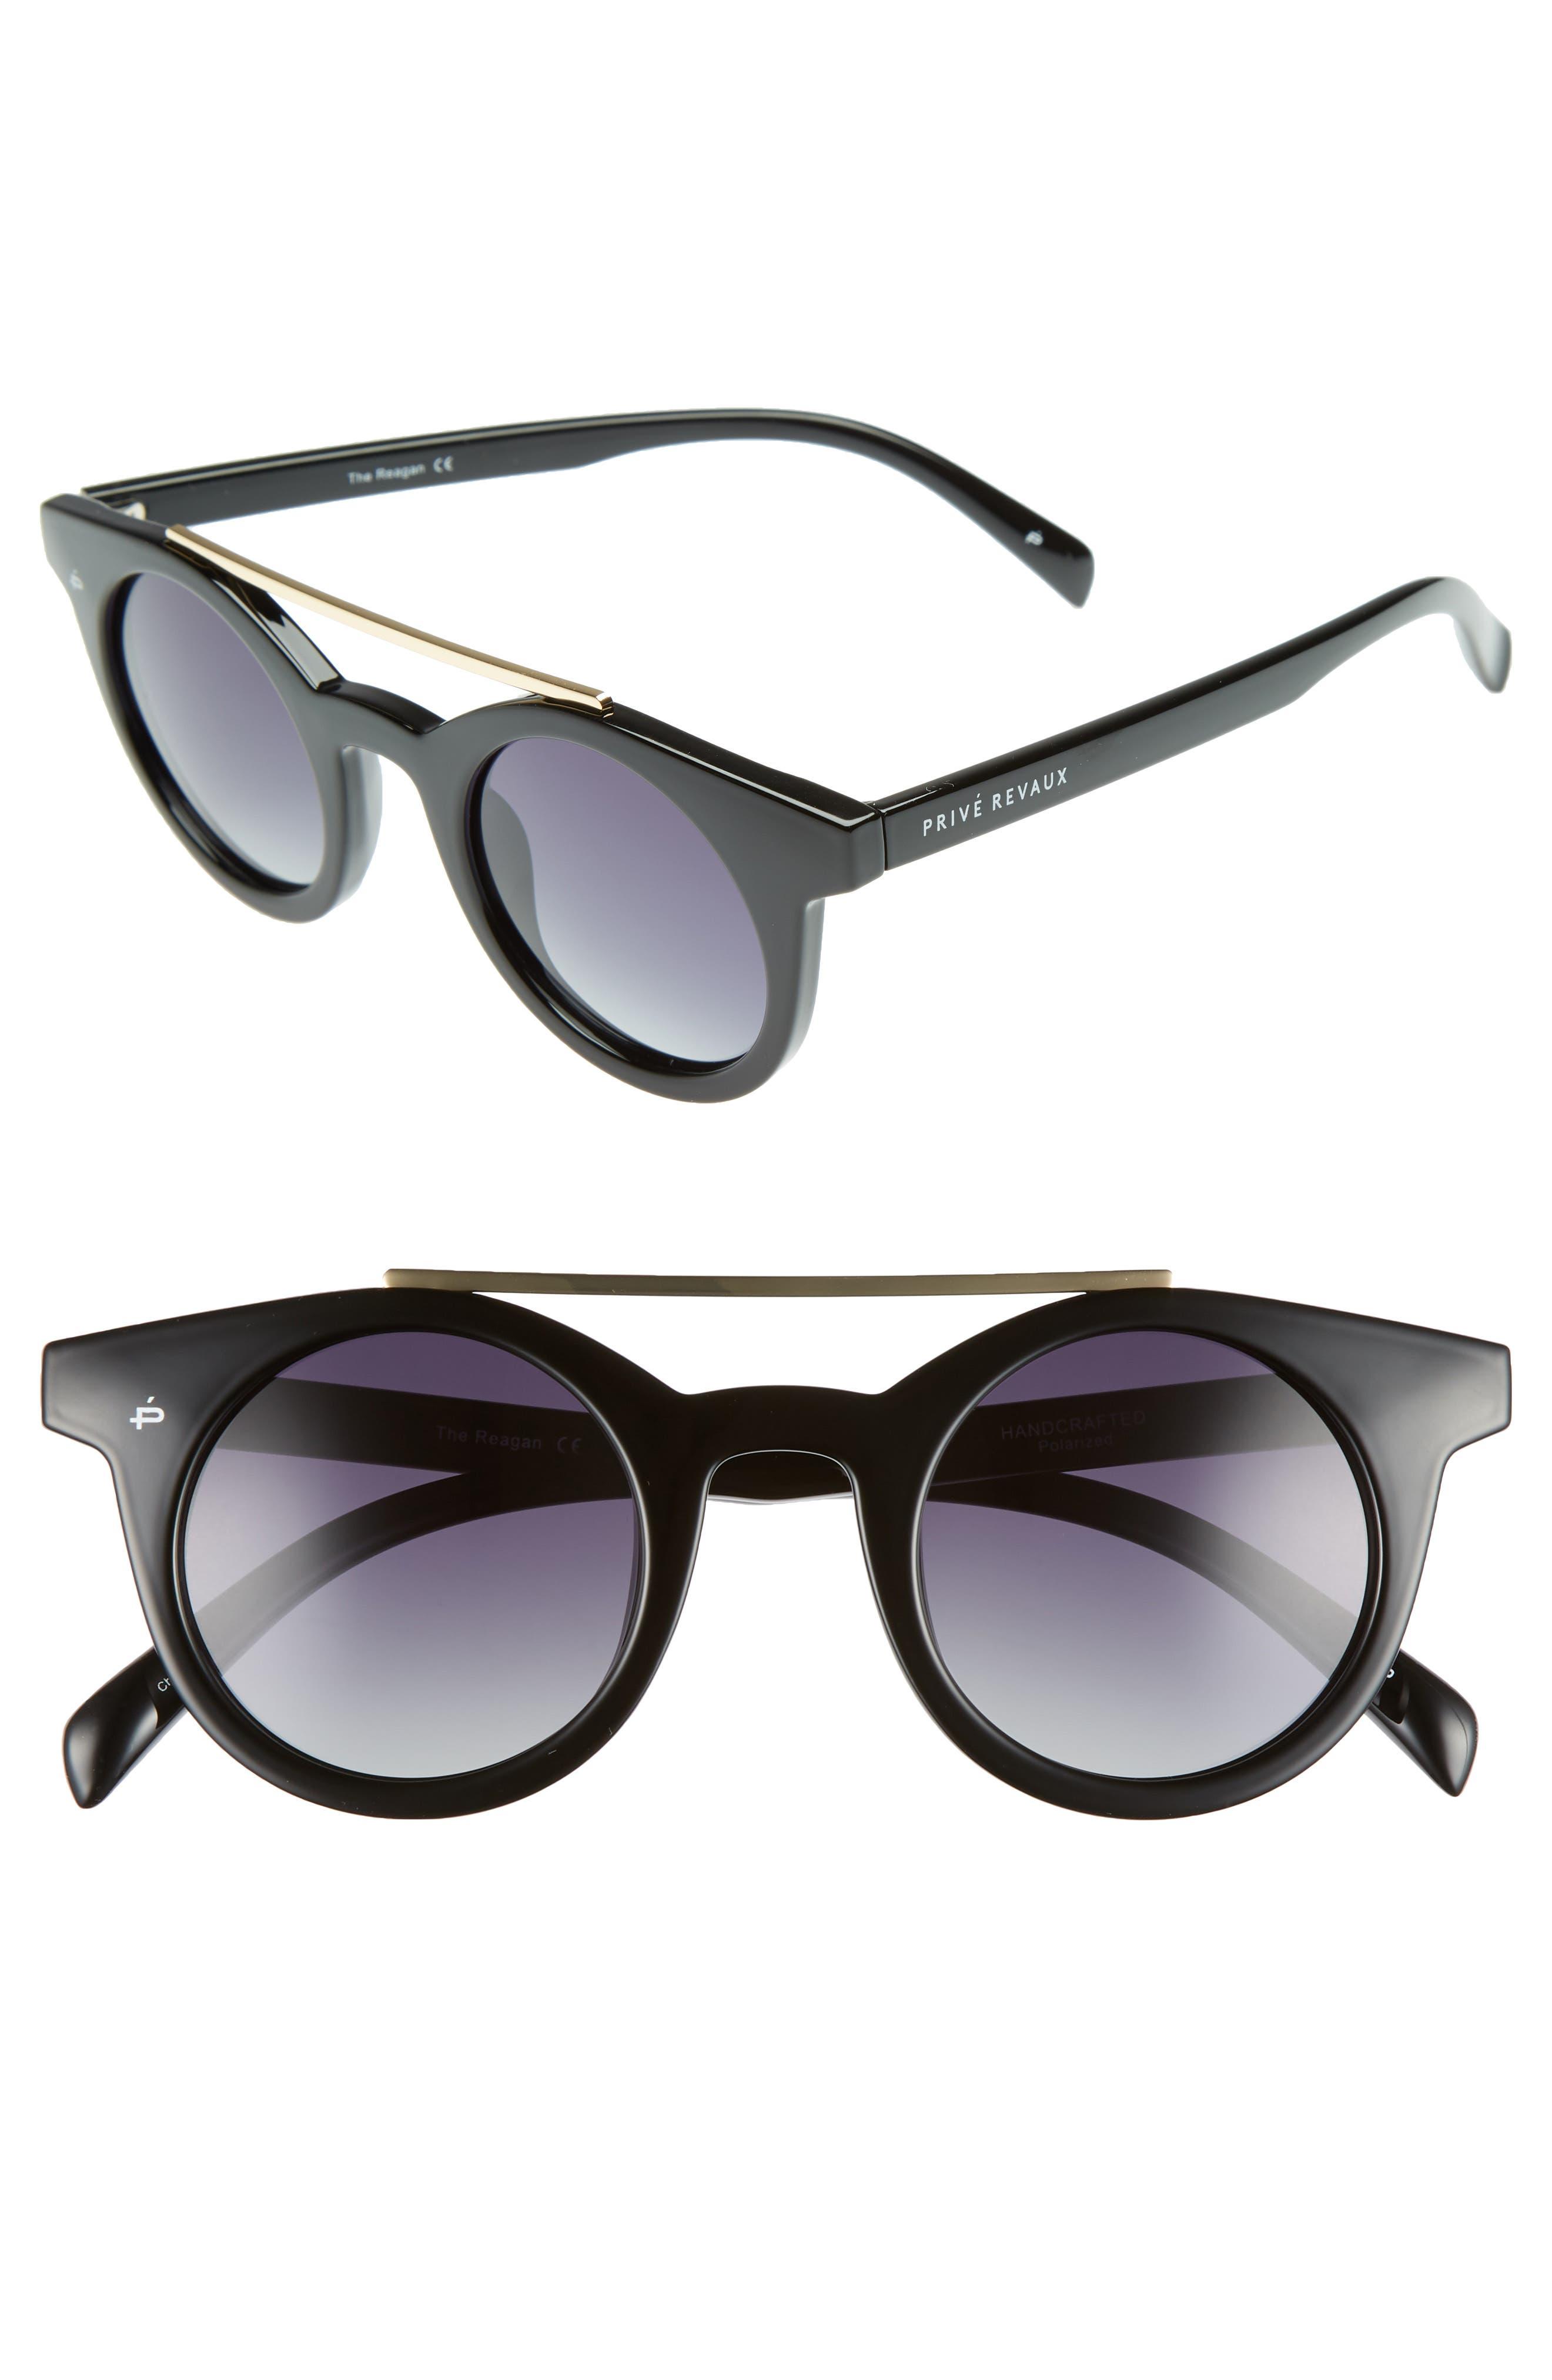 Main Image - Privé Revaux The Reagan 43mm Polarized Round Sunglasses